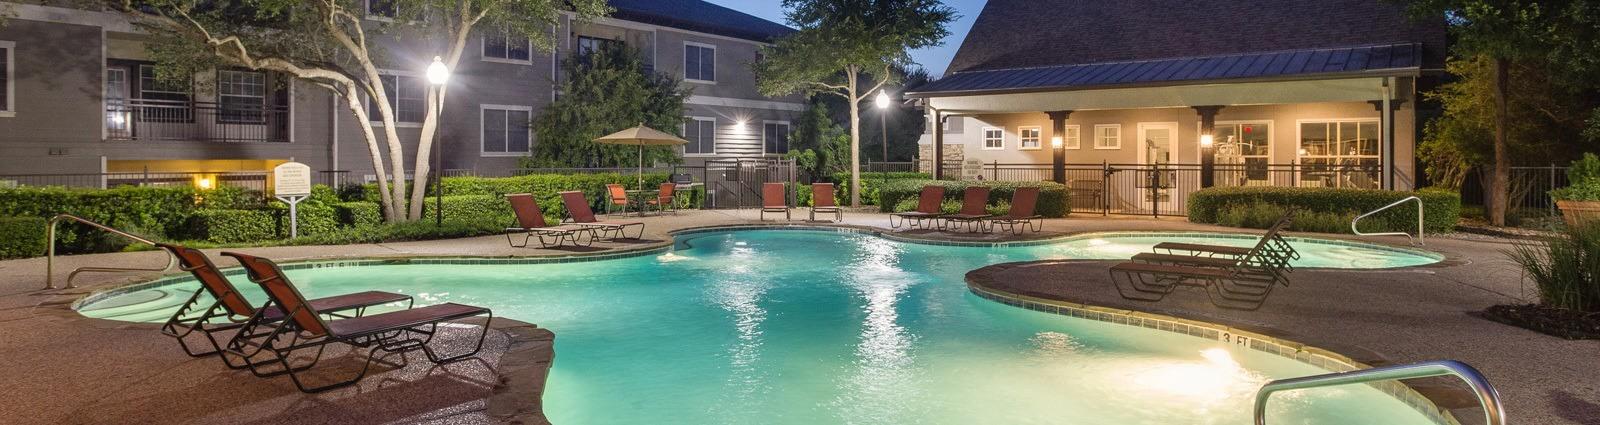 Apartments in Austin Texas